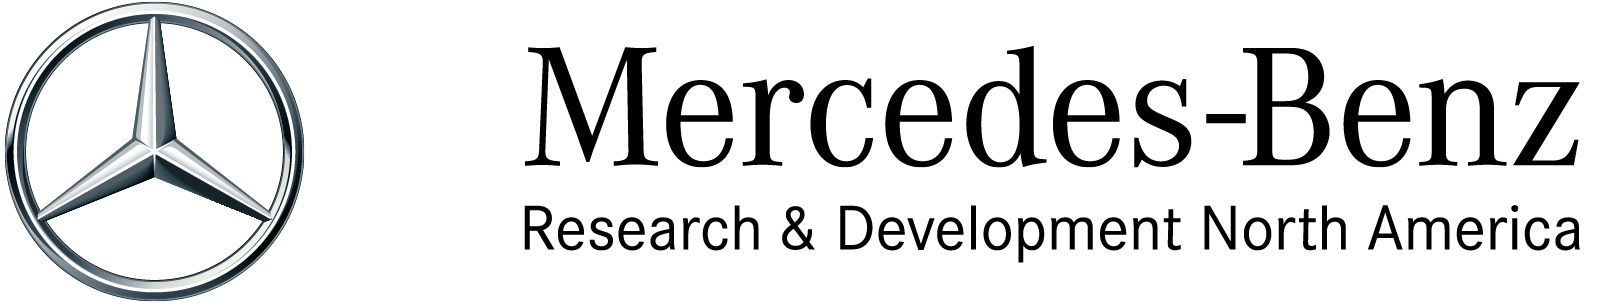 MBRDNA